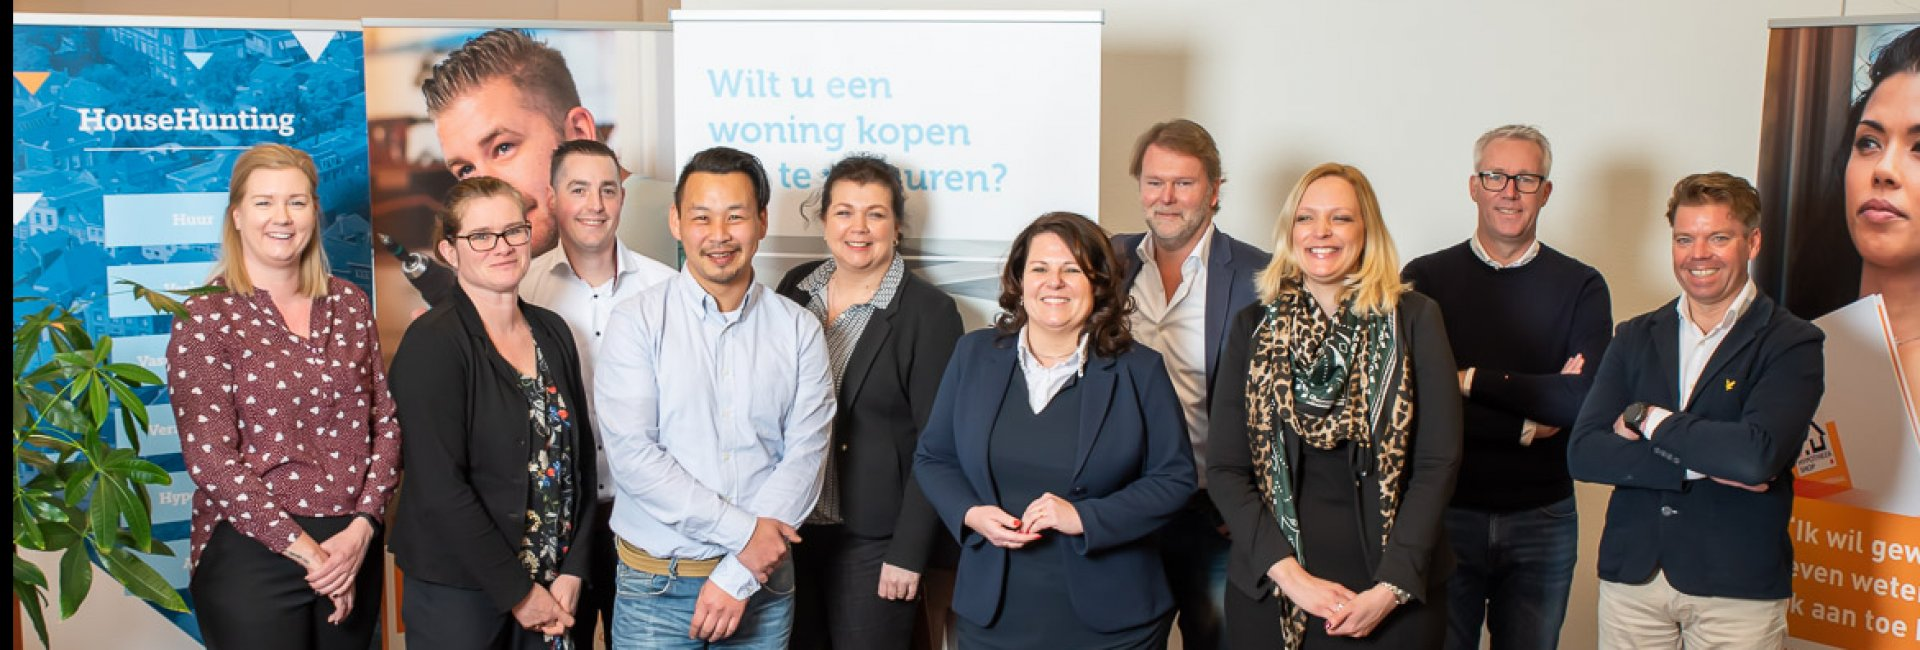 Hypotheekadvies in Sint-Oedenrode